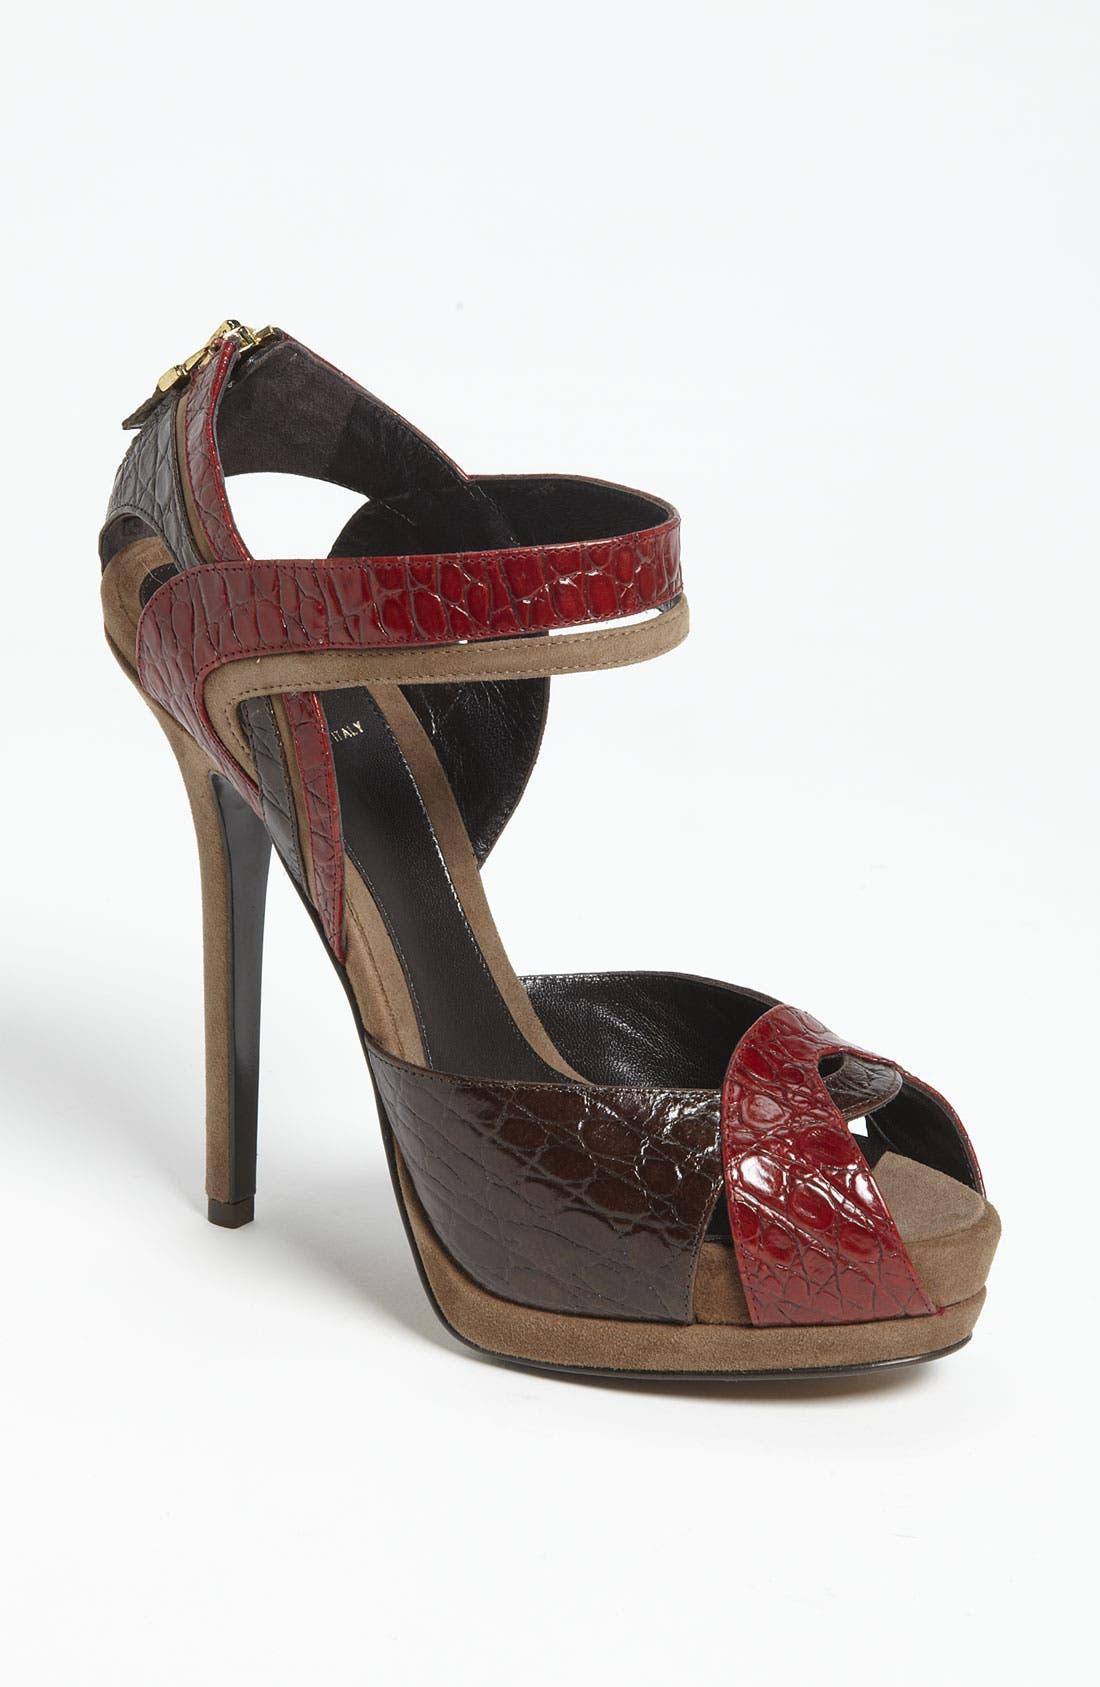 Alternate Image 1 Selected - Fendi 'Let Me In' Ankle Strap Sandal